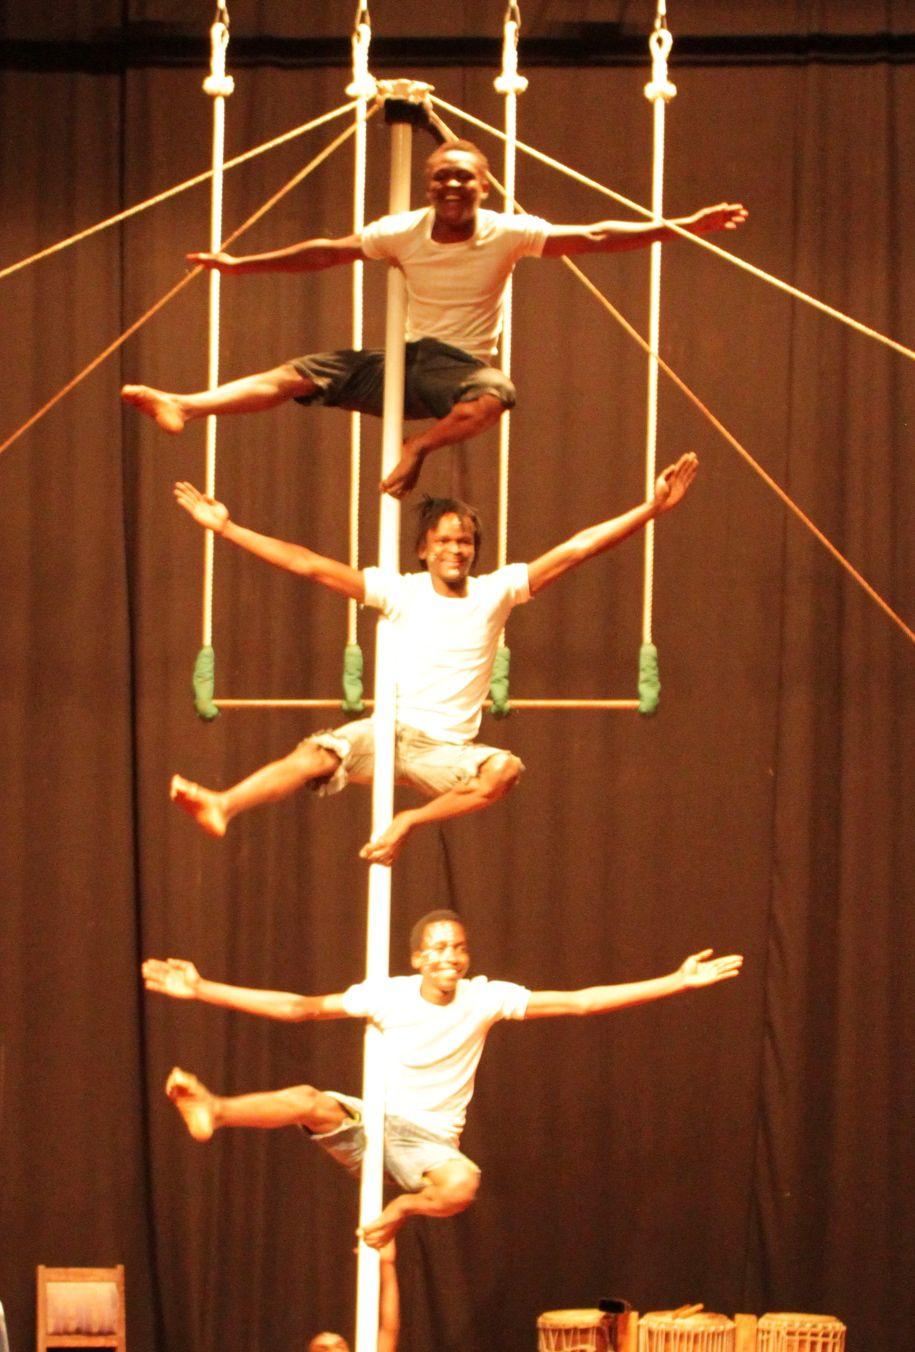 Juma, Salim and Nossoro.jpg